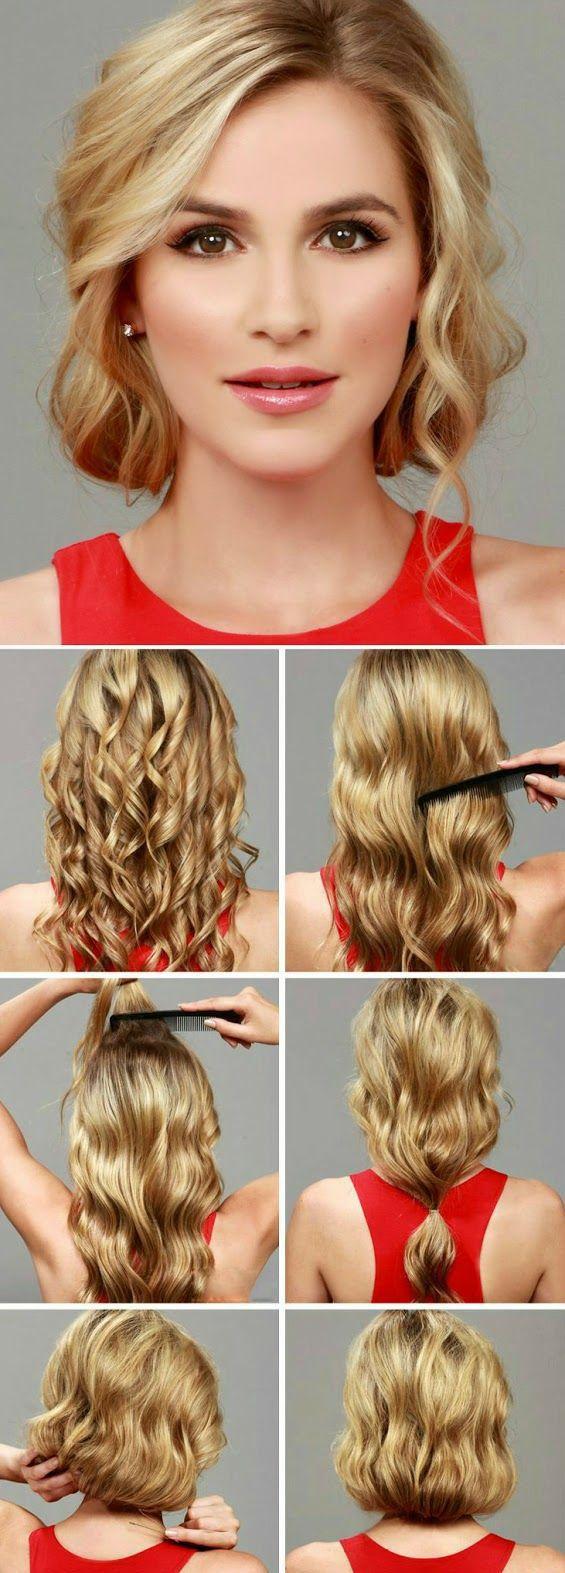 Incredible 1000 Ideas About Flapper Hairstyles On Pinterest Revlon Short Hairstyles Gunalazisus